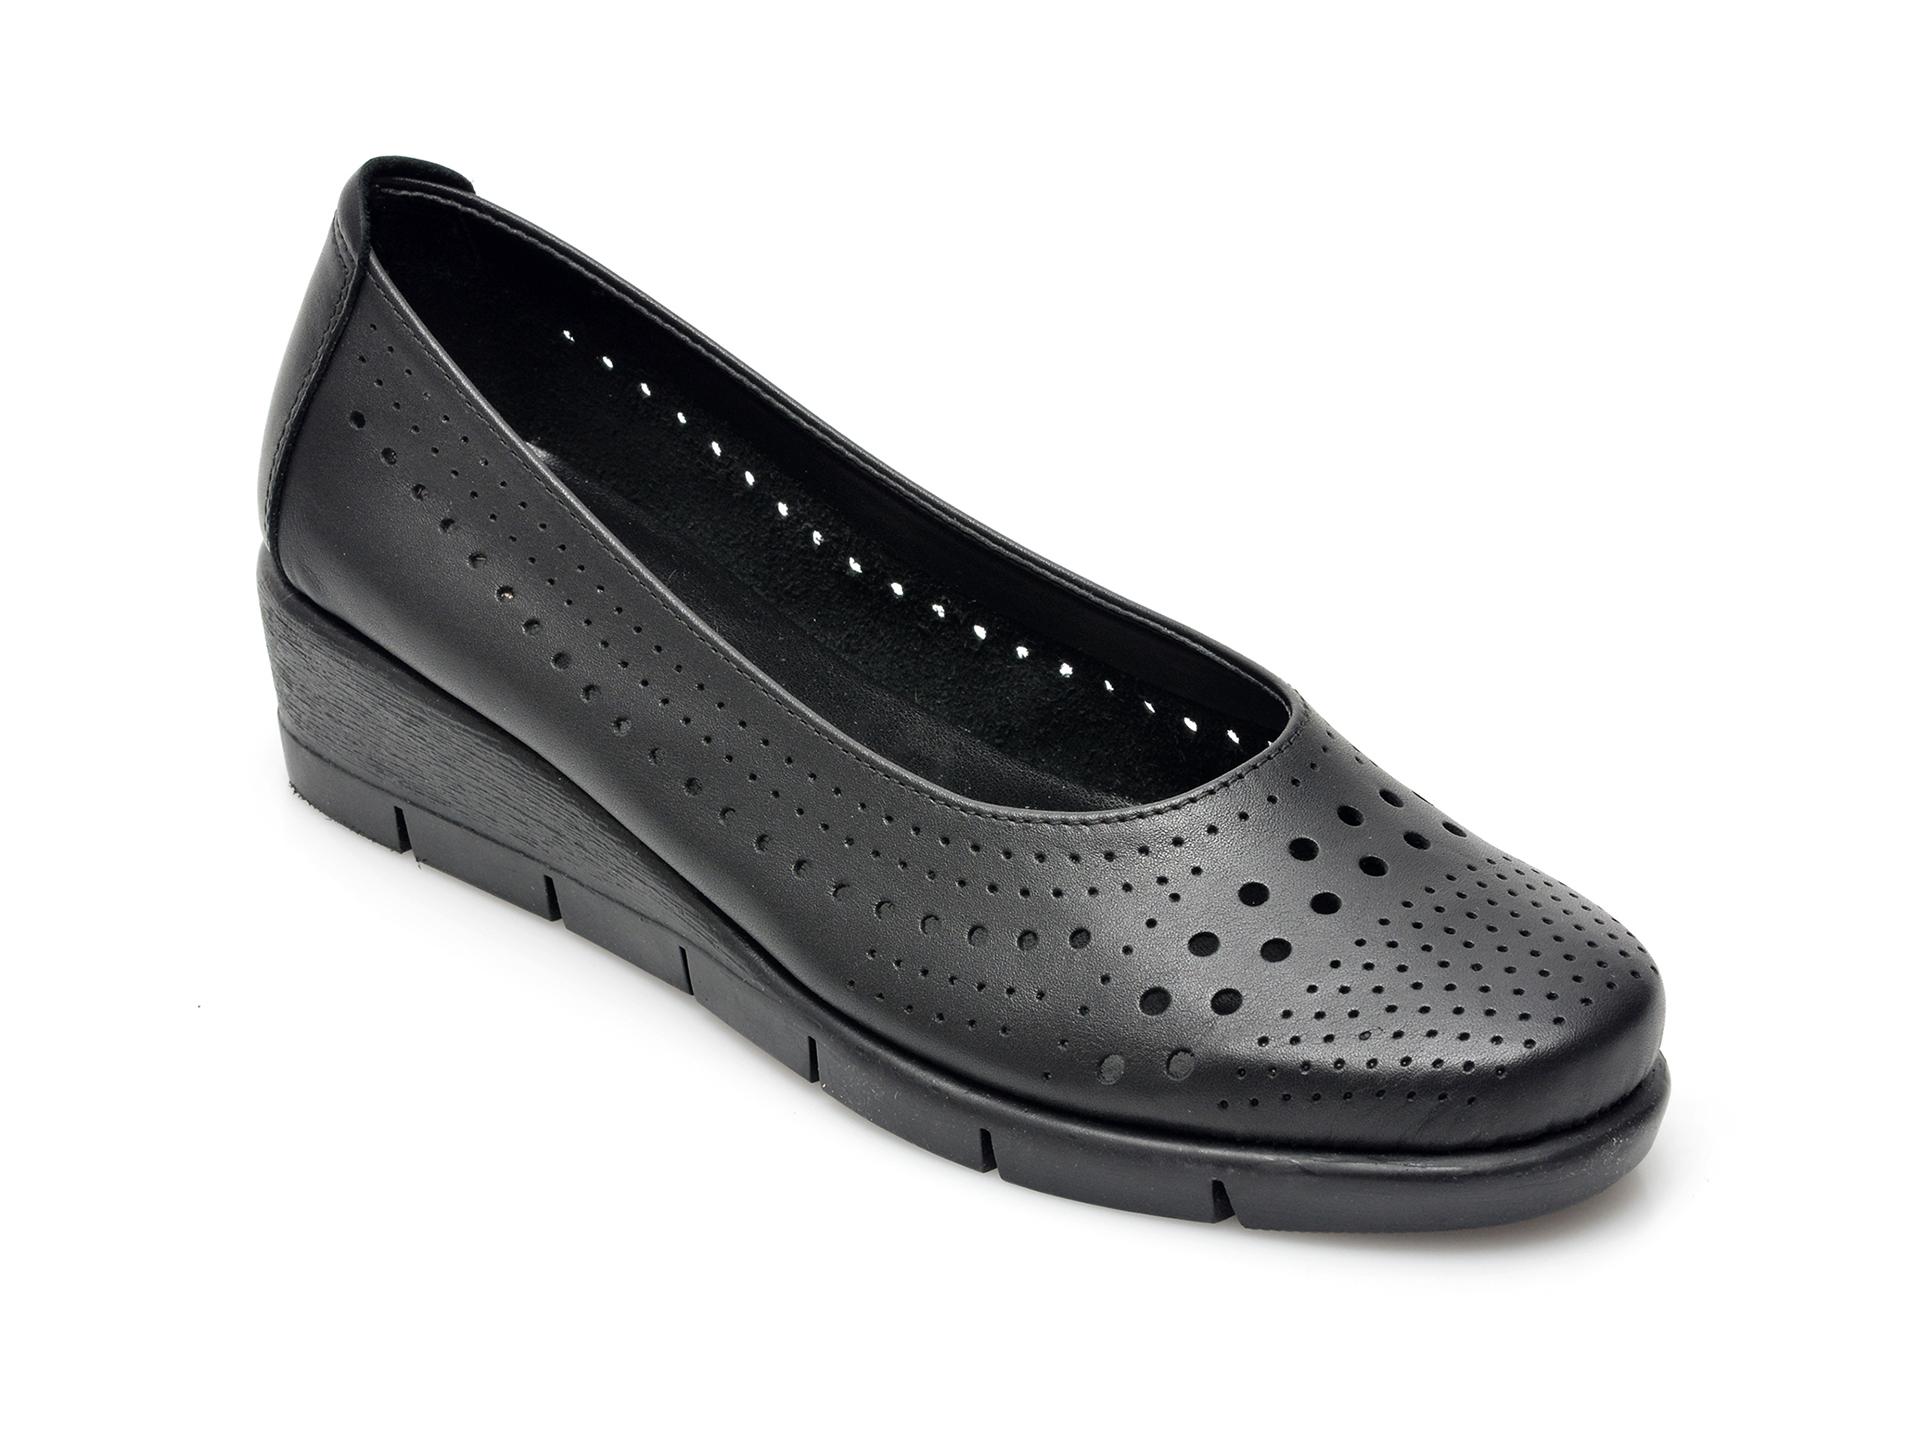 Pantofi FLEXX negri, B23537, din piele naturala